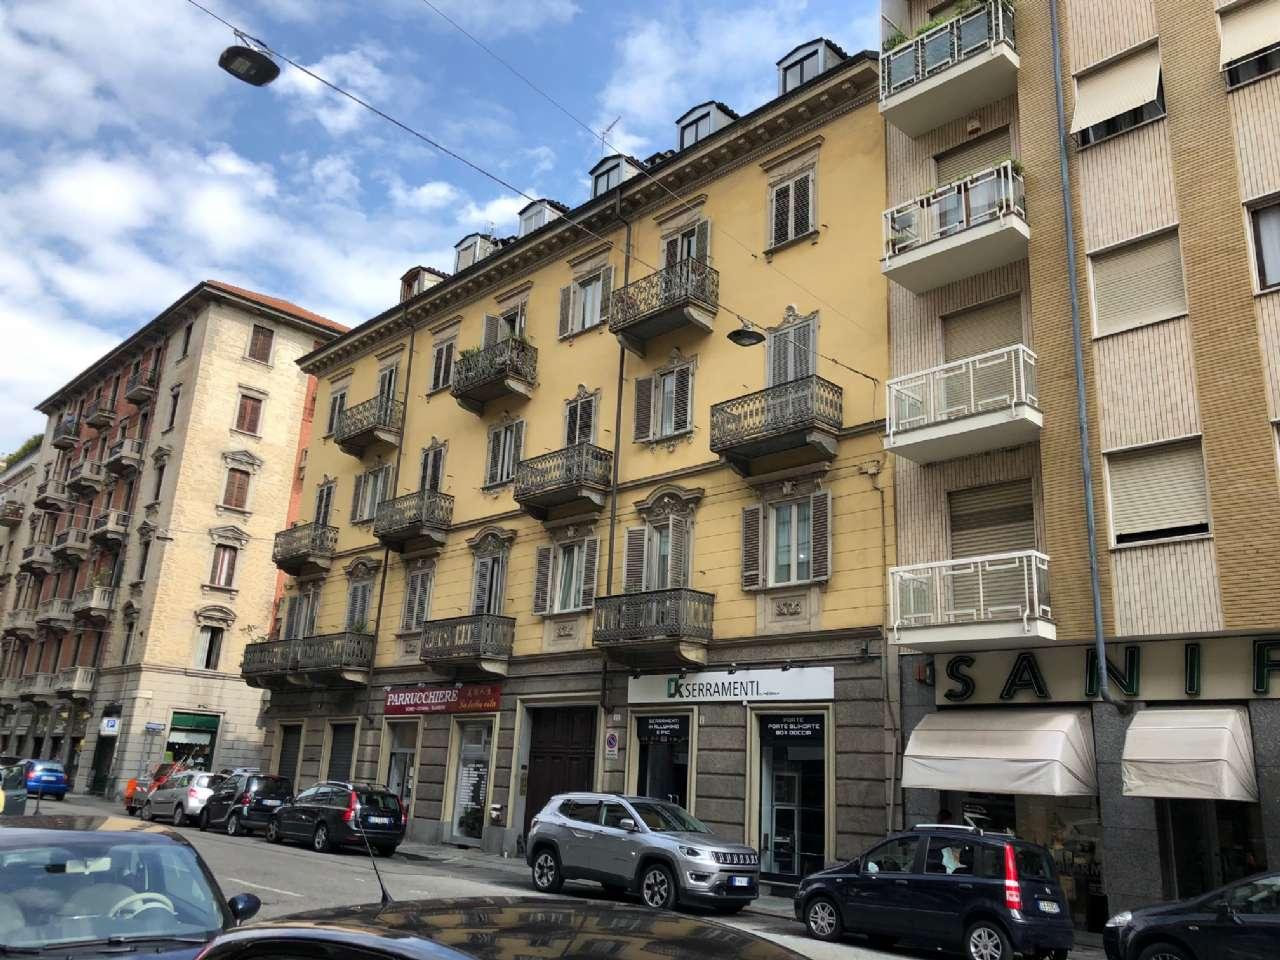 Foto 1 di Mansarda via duchessa jolanda 12, Torino (zona Cit Turin, San Donato, Campidoglio)